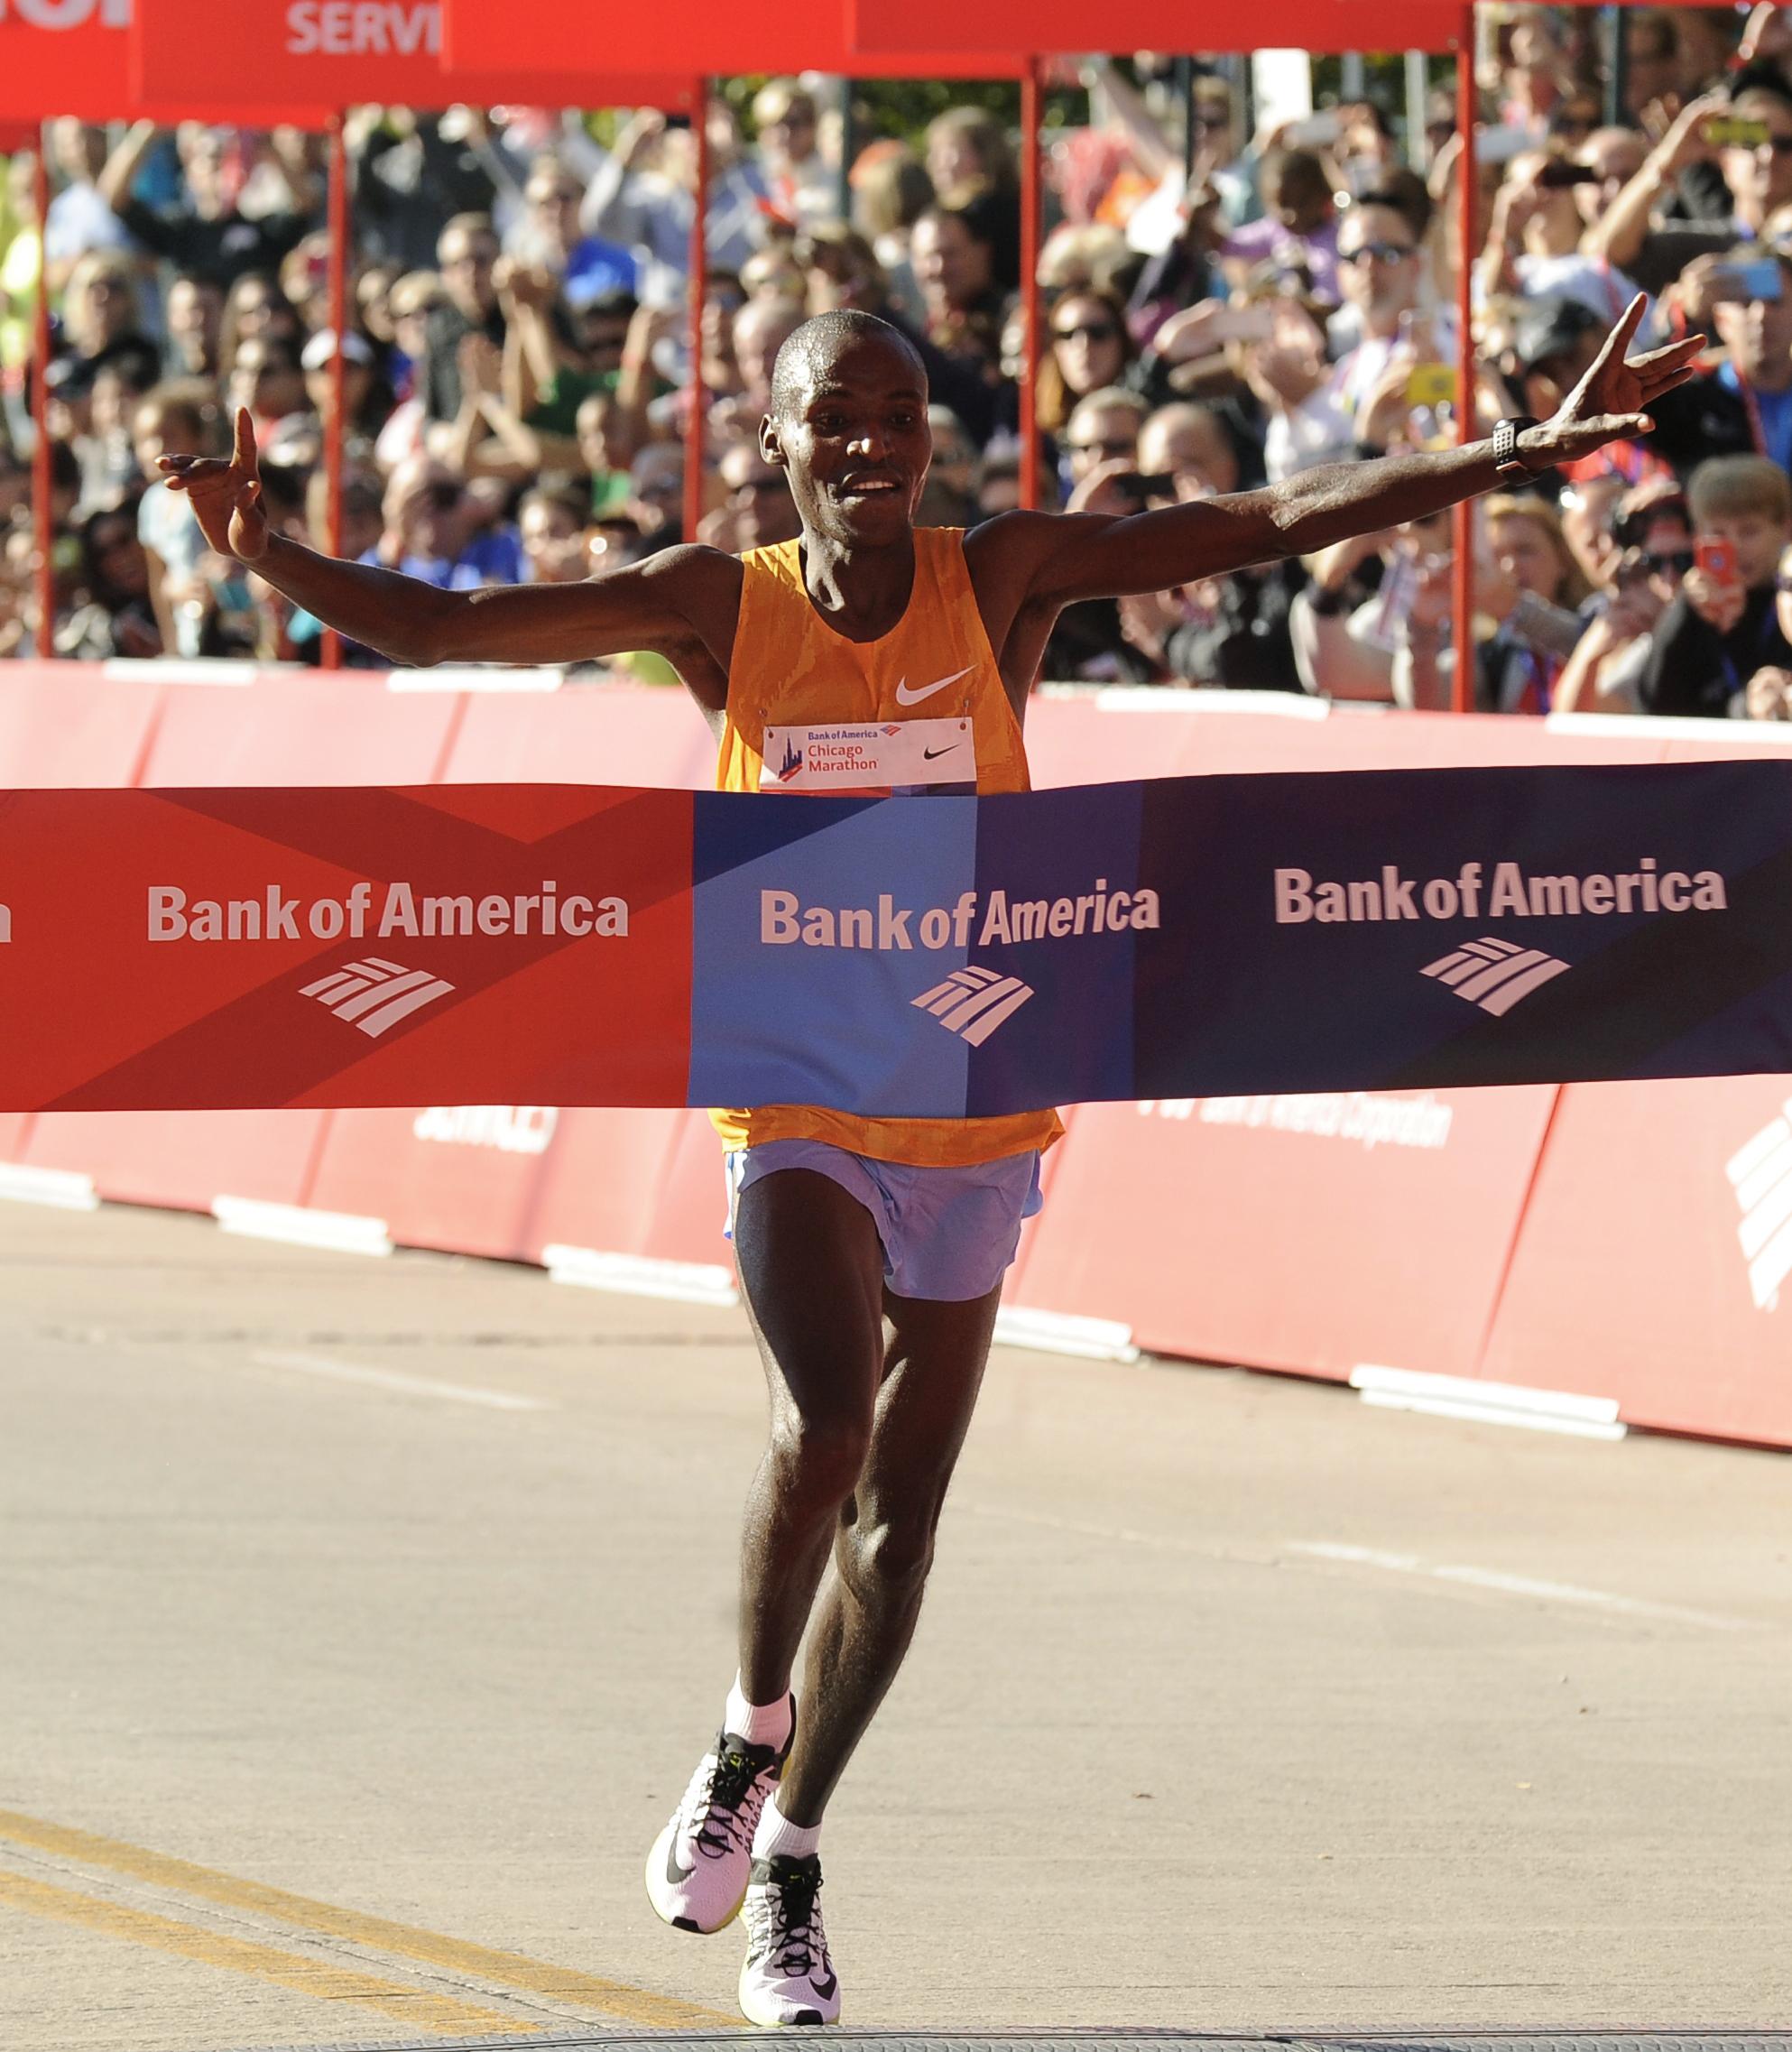 Dickson Chumba of Kenya wins the 2015 Bank of America Chicago Marathon, Sunday, Oct. 11, 2015, in Chicago. (AP Photo/Paul Beaty)